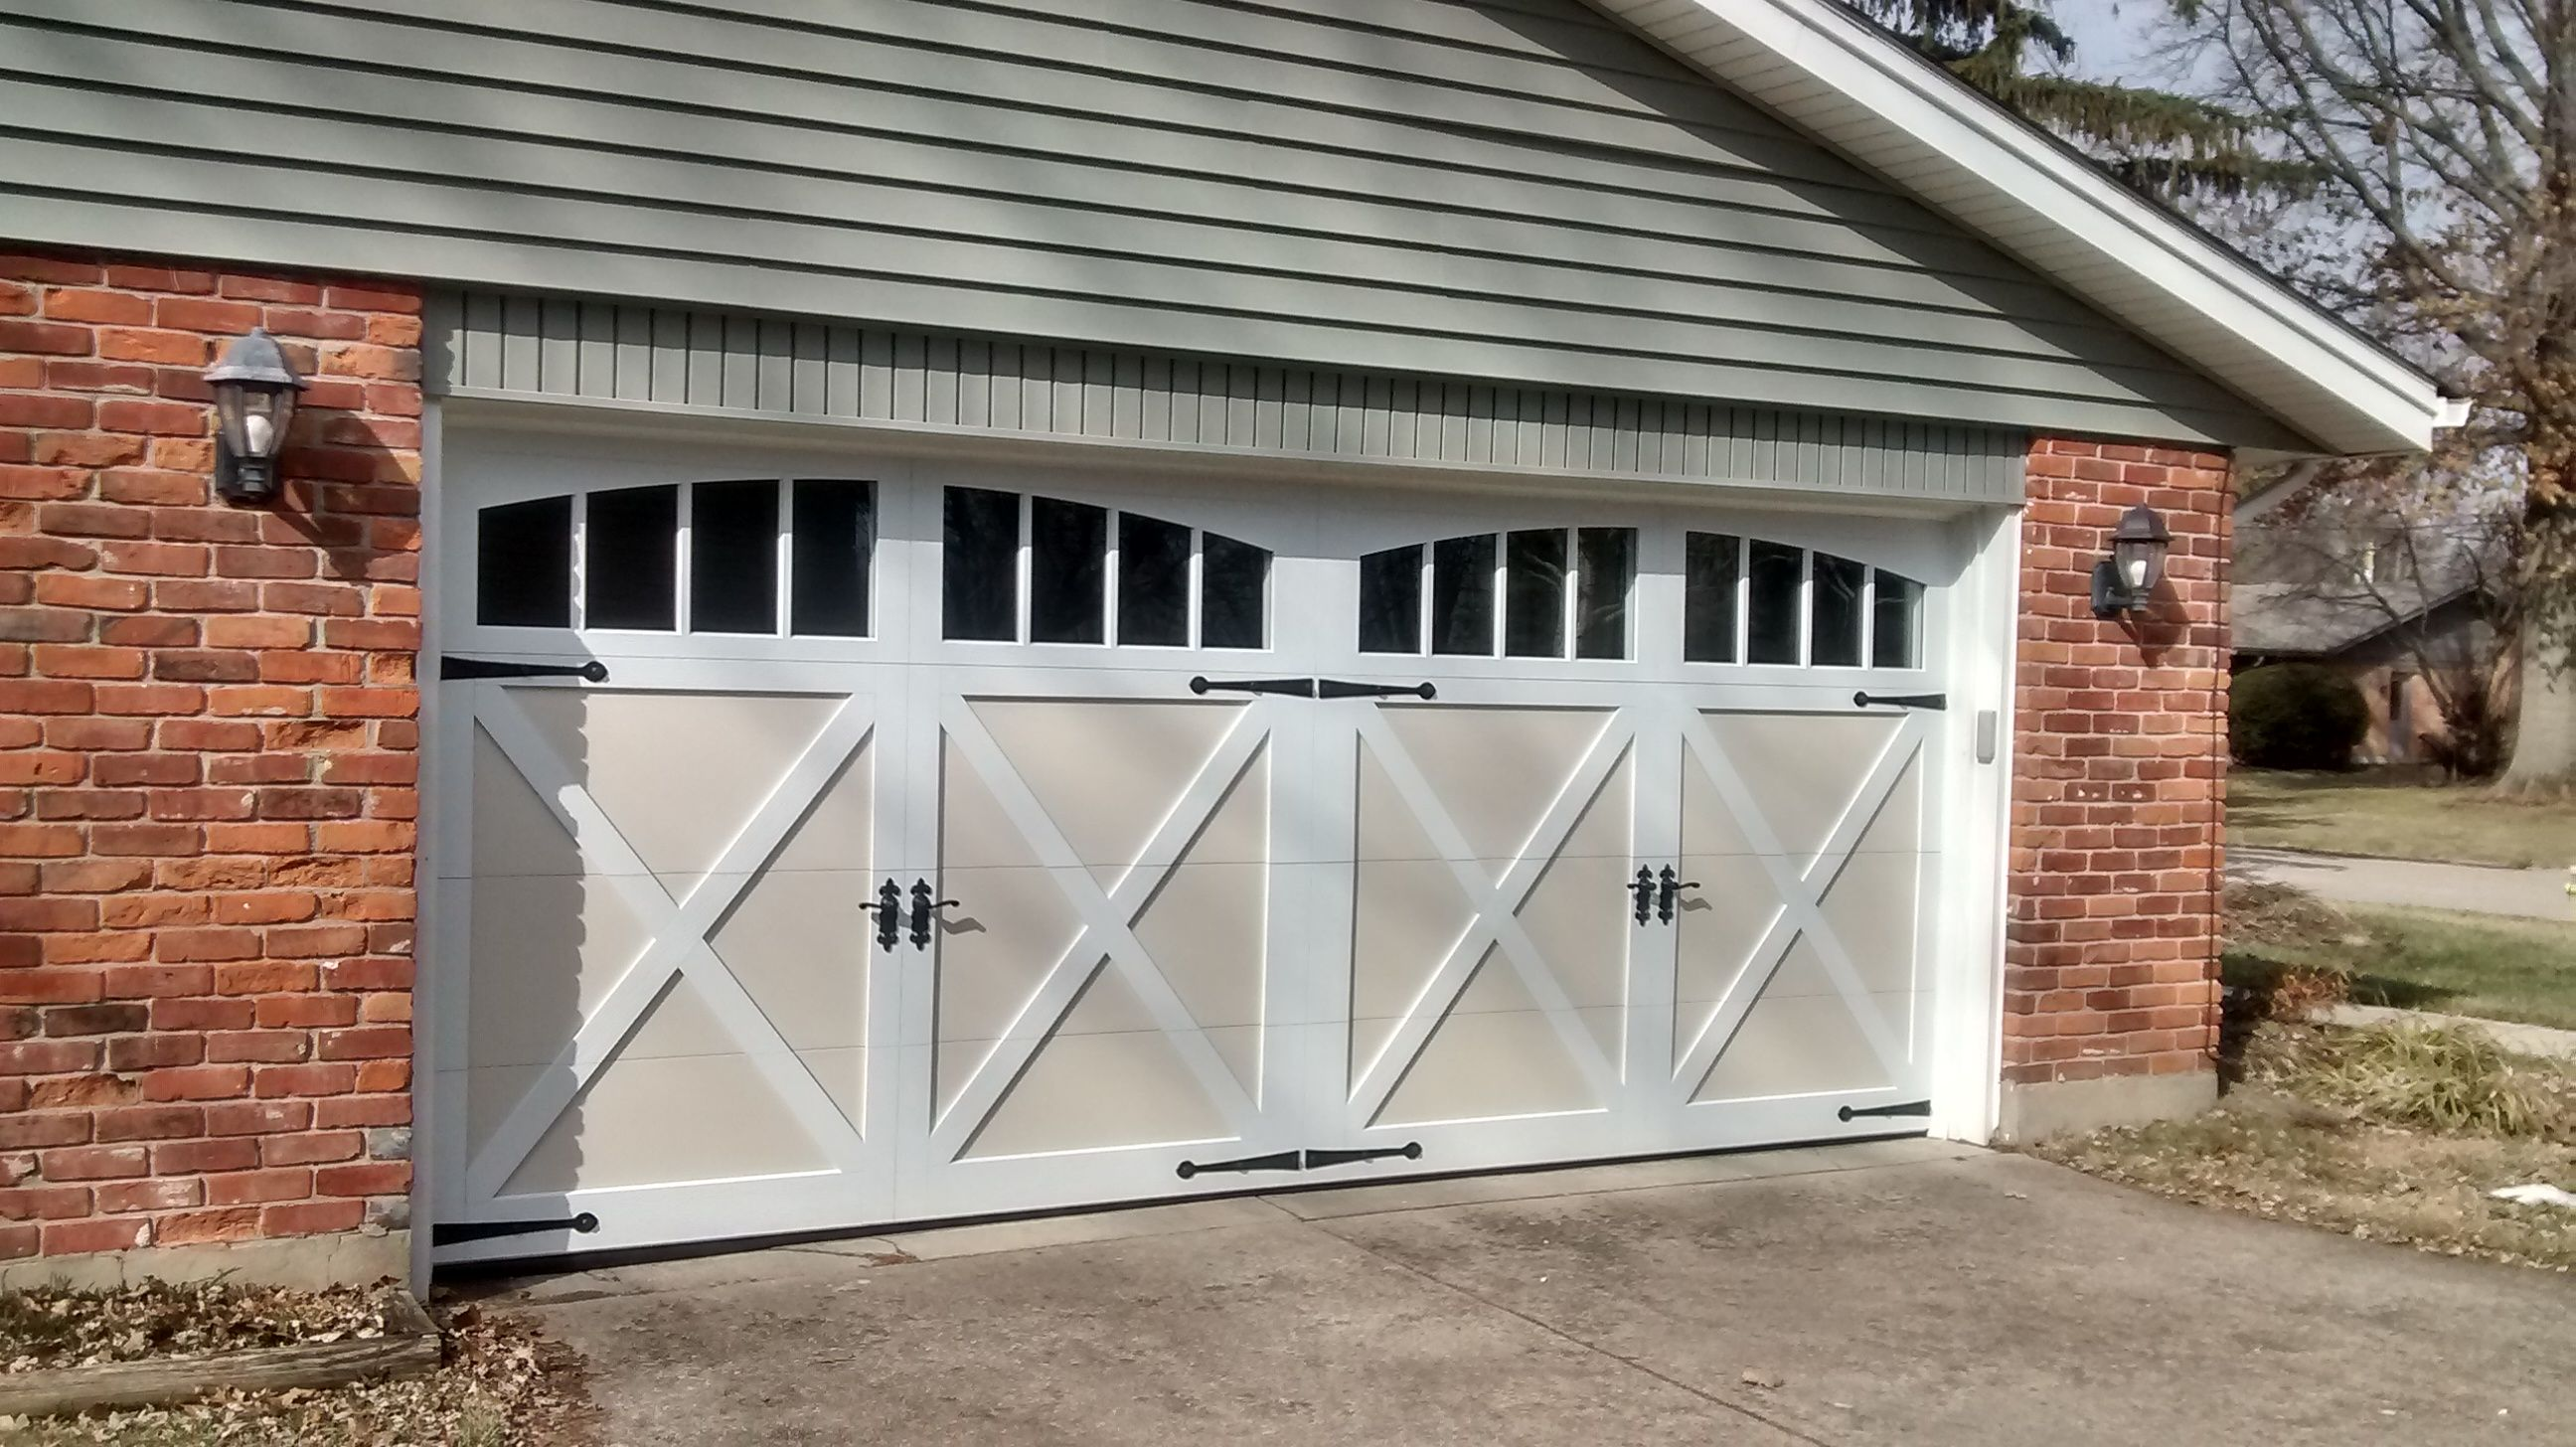 GarageDoors Garage DoorSales Dayton Highfield GarageDoorRepair